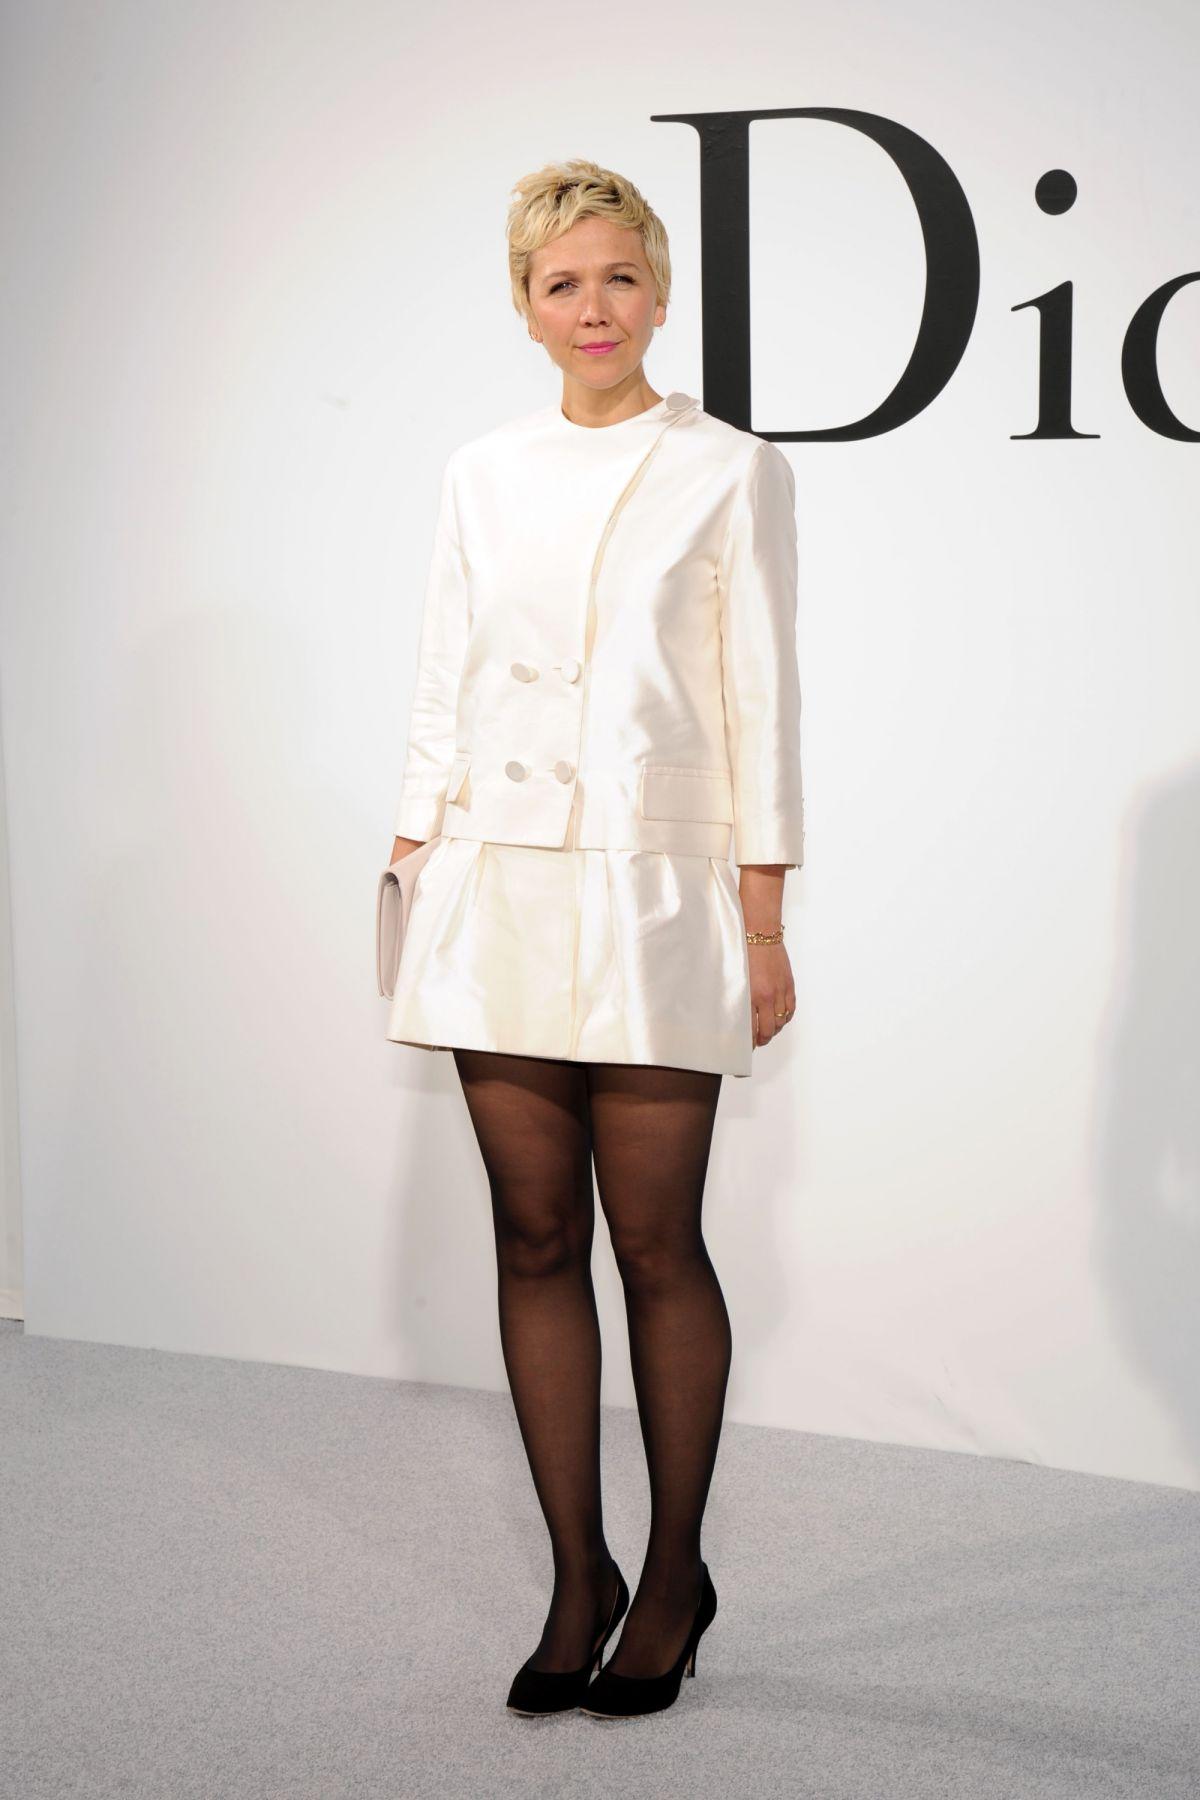 MAGGIE GYLLENHAAL at Dior Cruise 2015 Fashion Show ... мэгги джилленхол